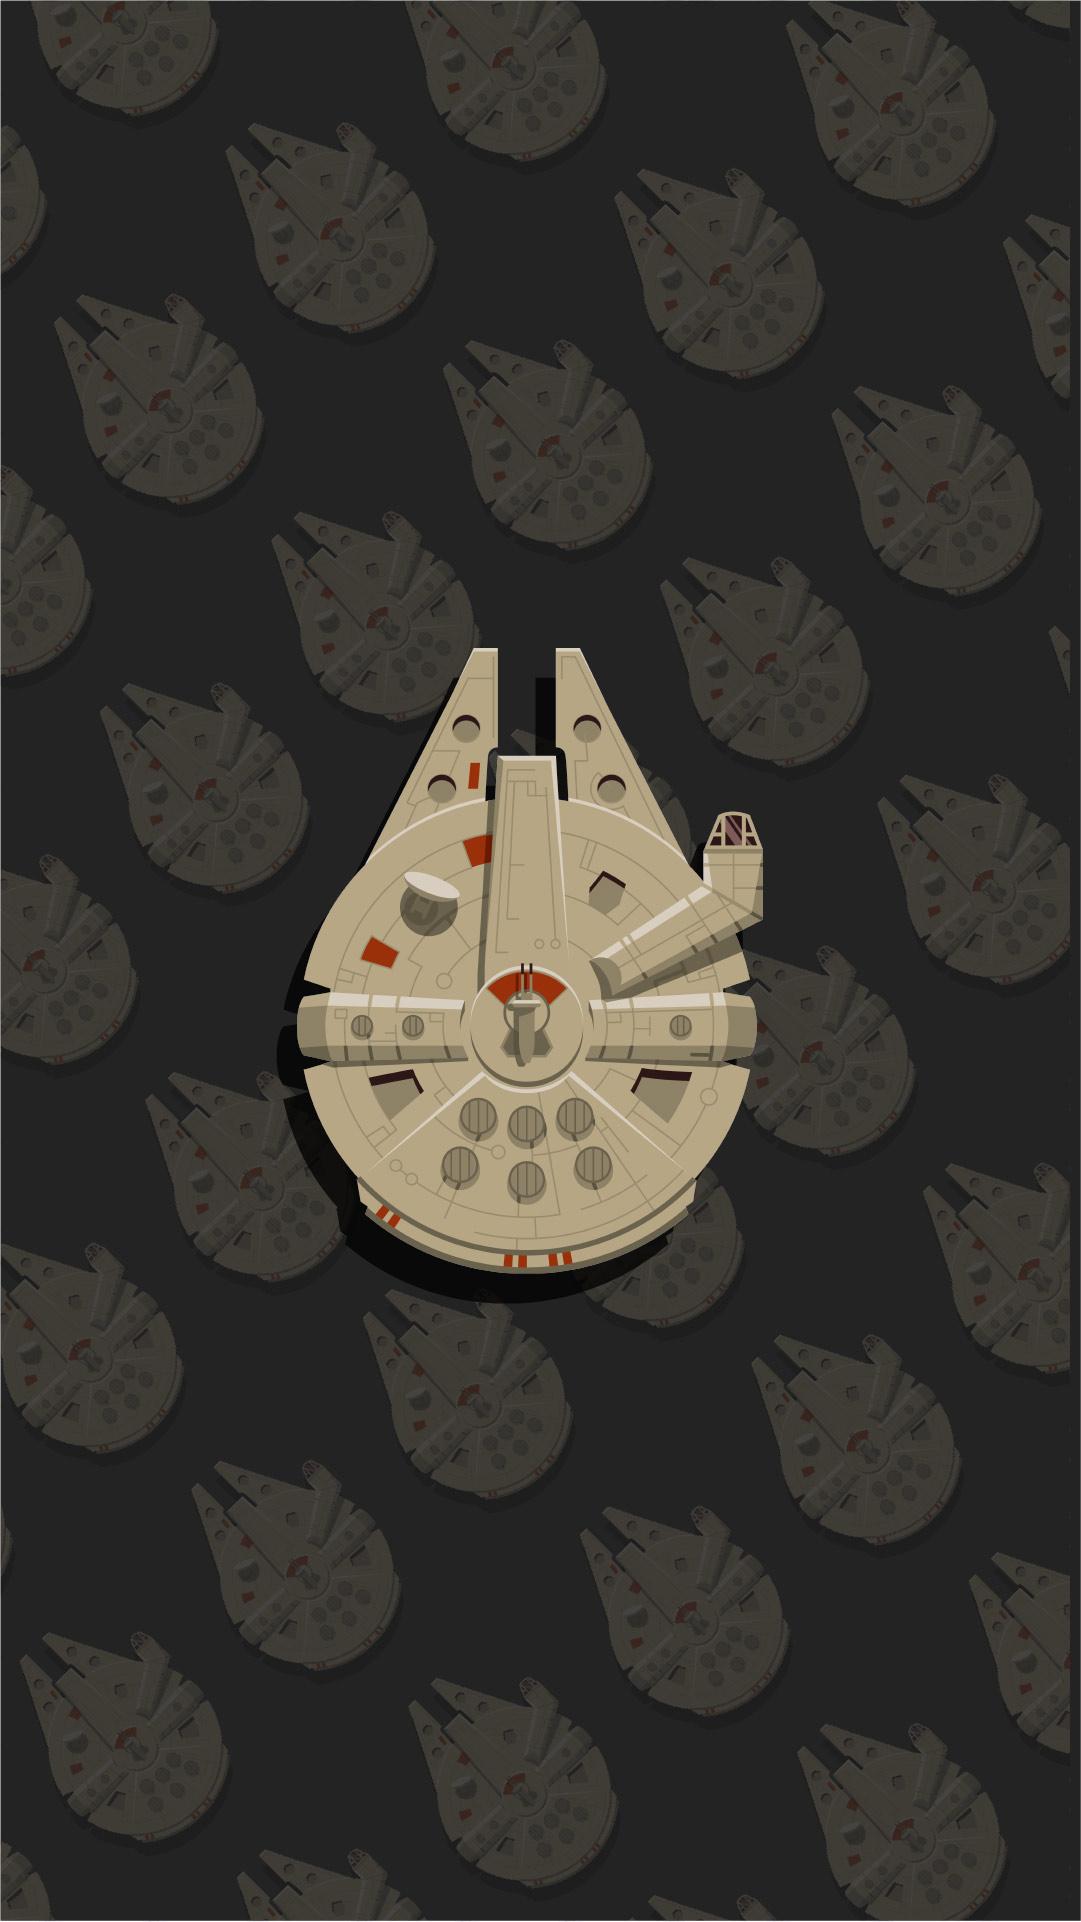 Hd Wallpapers Star Wars Fondos De Pantalla